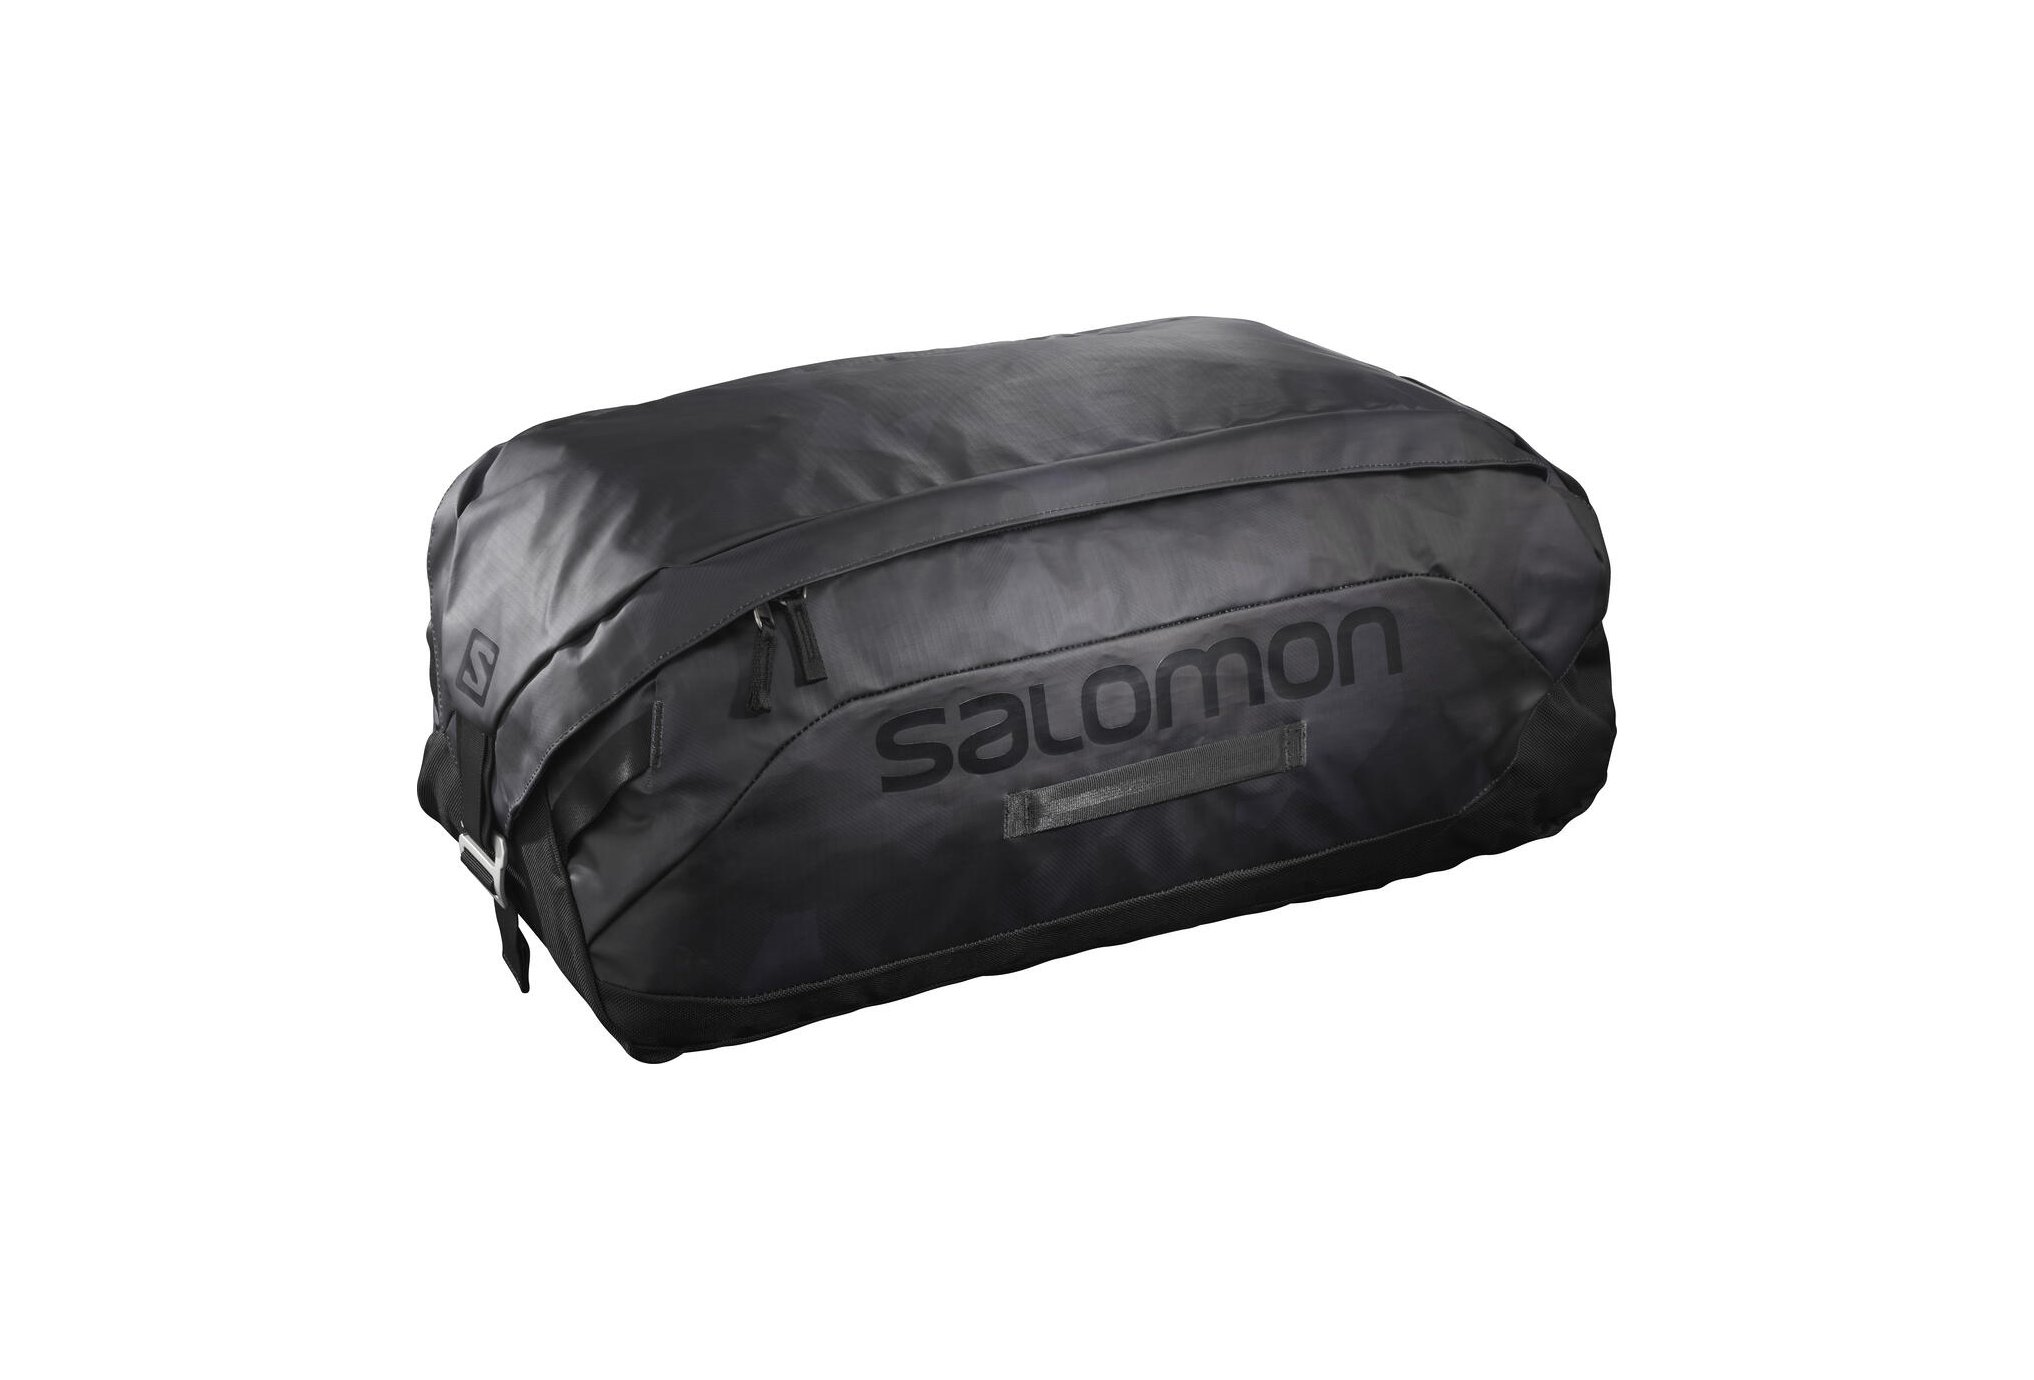 Salomon Outlife Duffel 45 Sac de sport